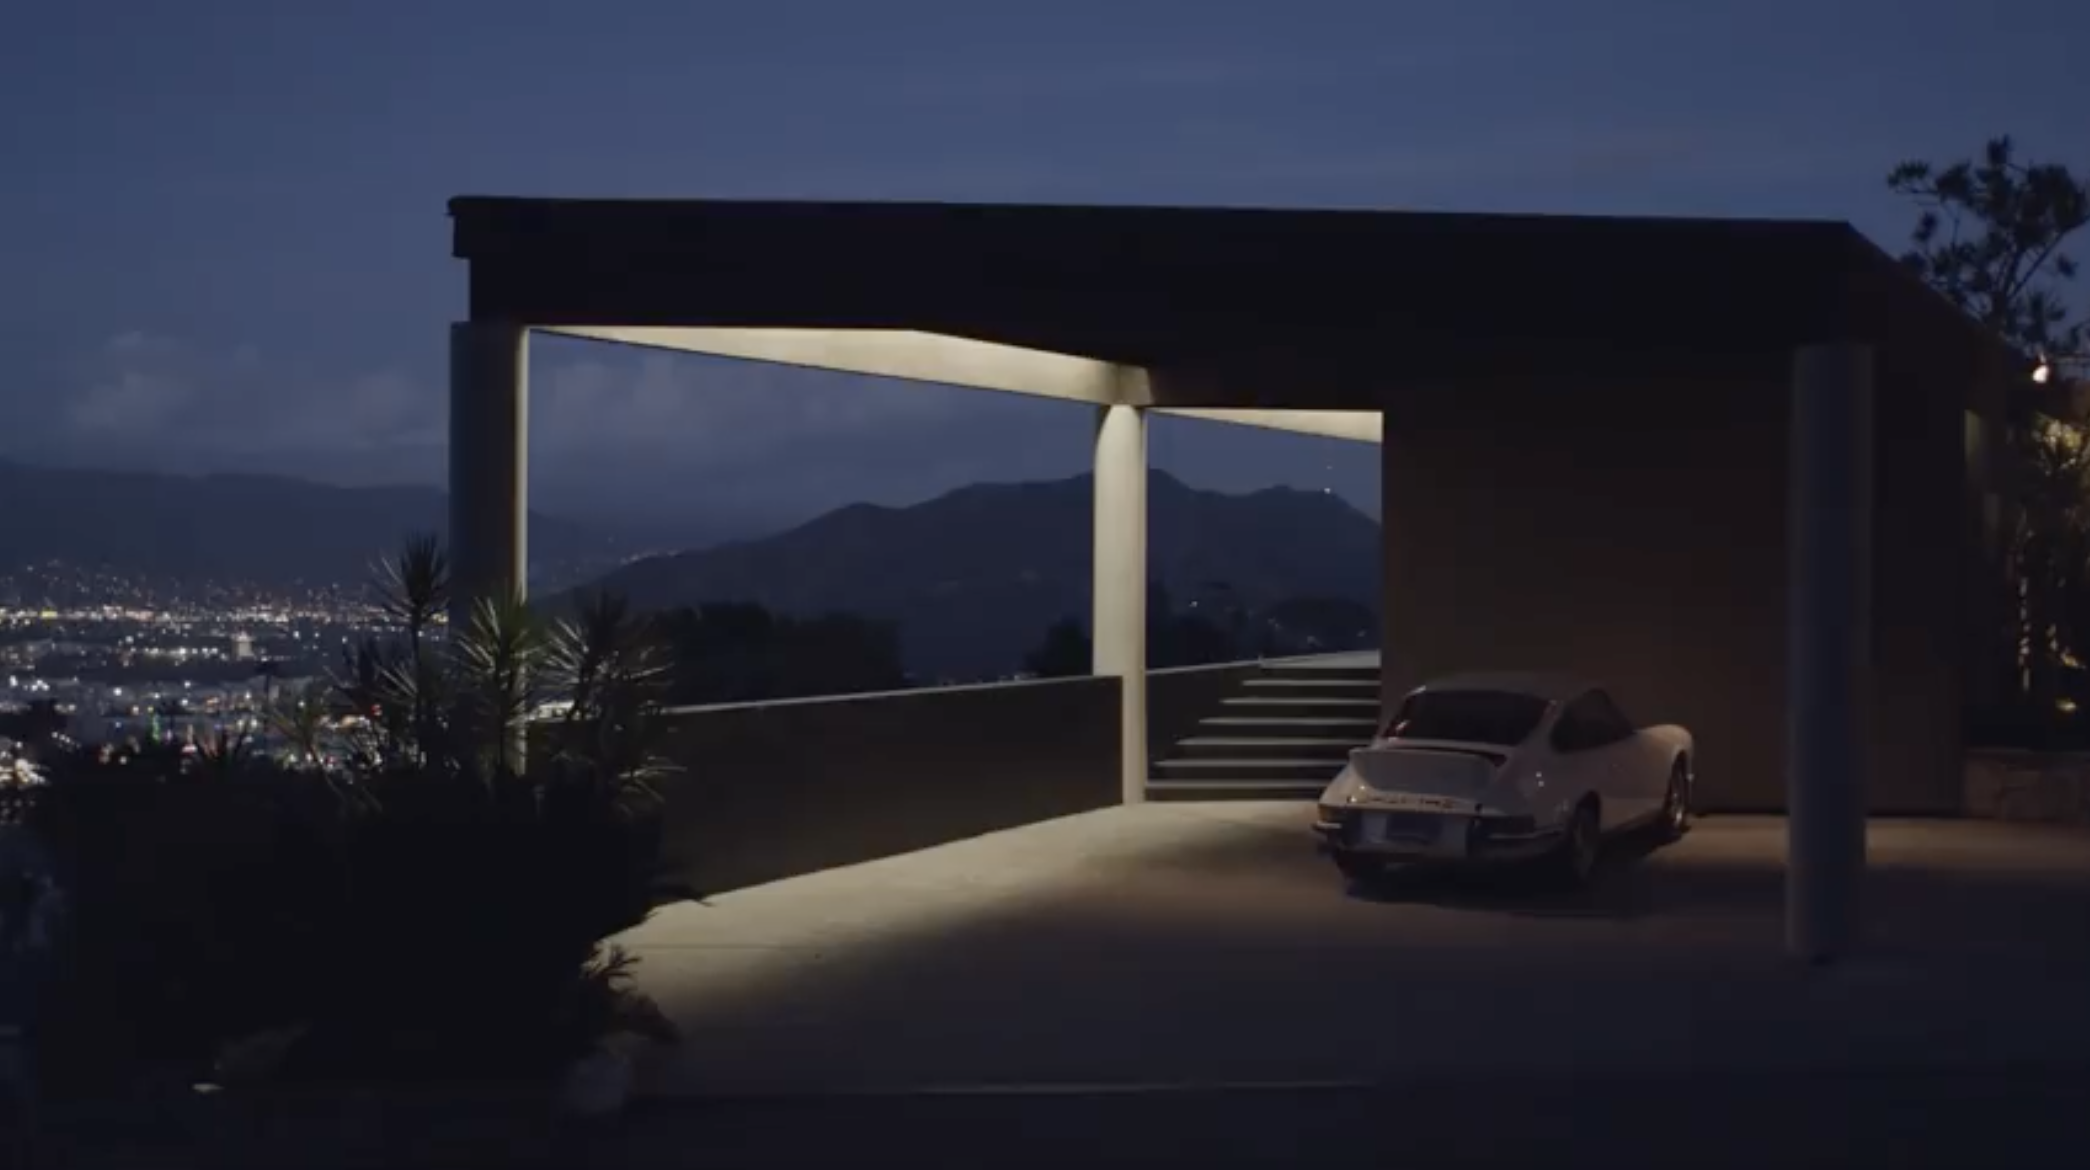 Lutner House-Mark Haddawy1.png